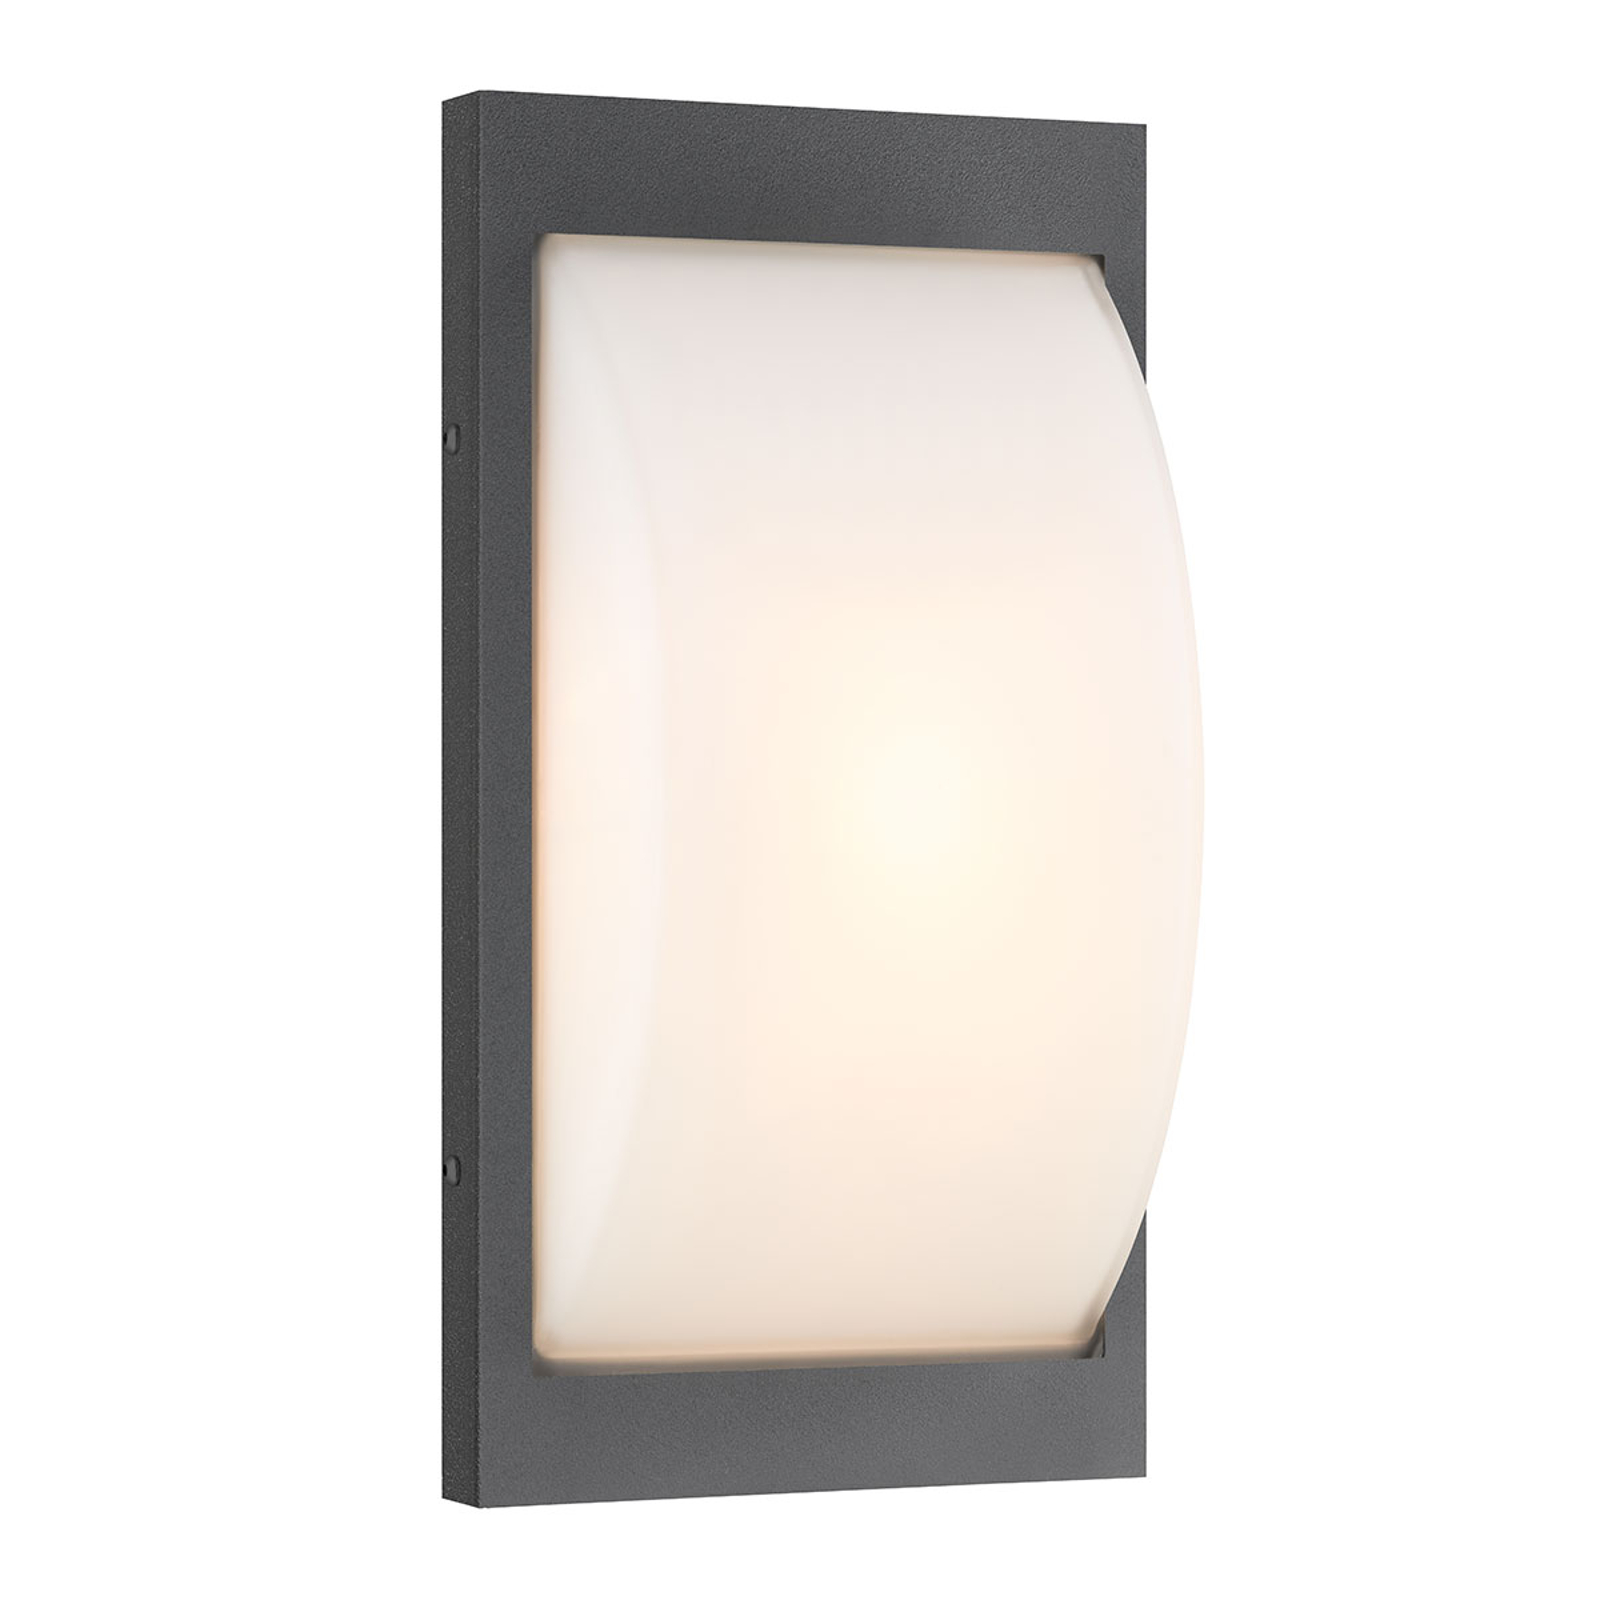 Buitenwandlamp type 069 E27 grafiet